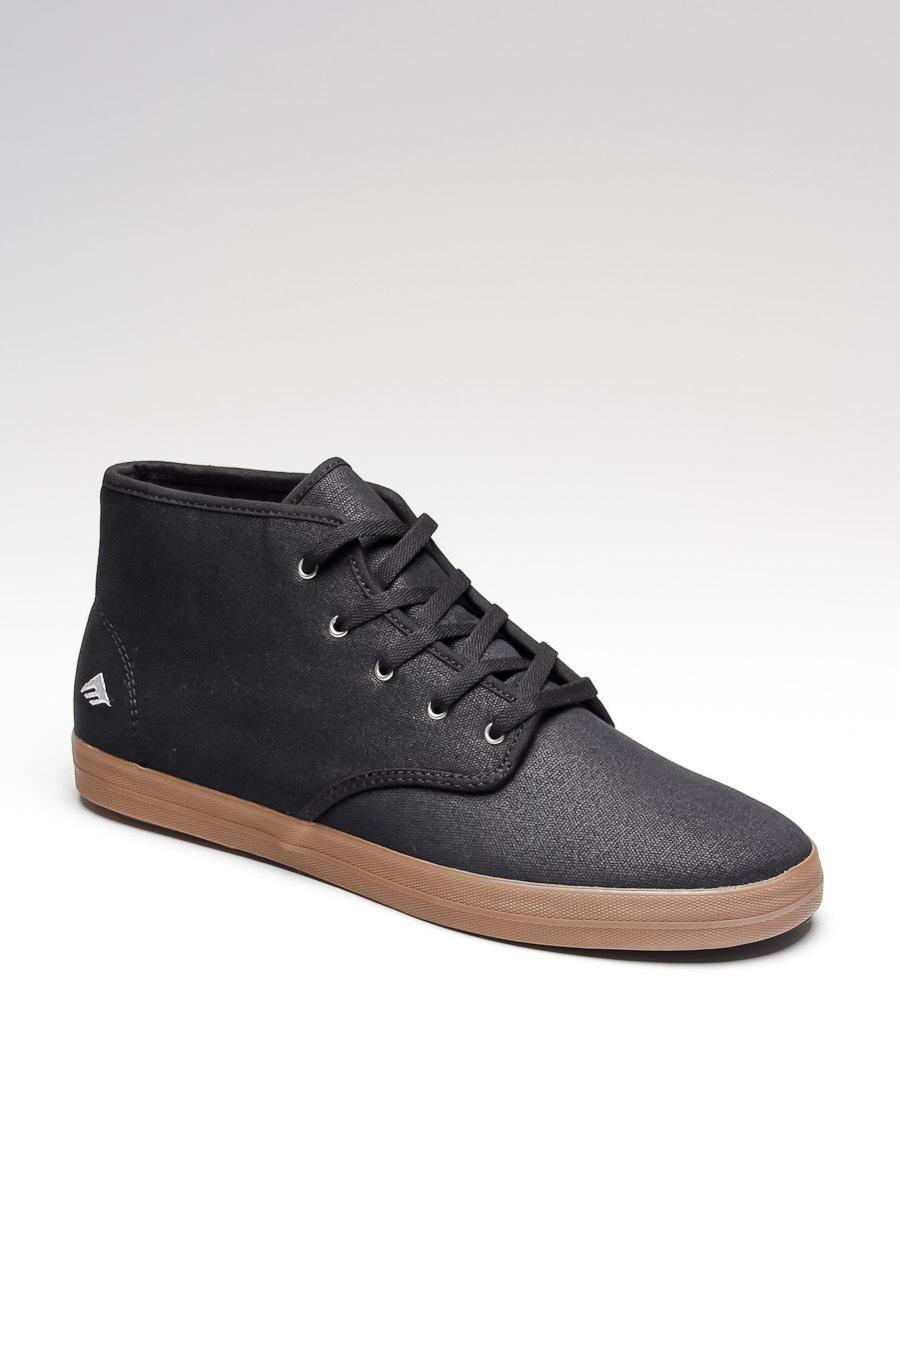 EMERICA Shoe THE LEO blue white Schuh Sneaker